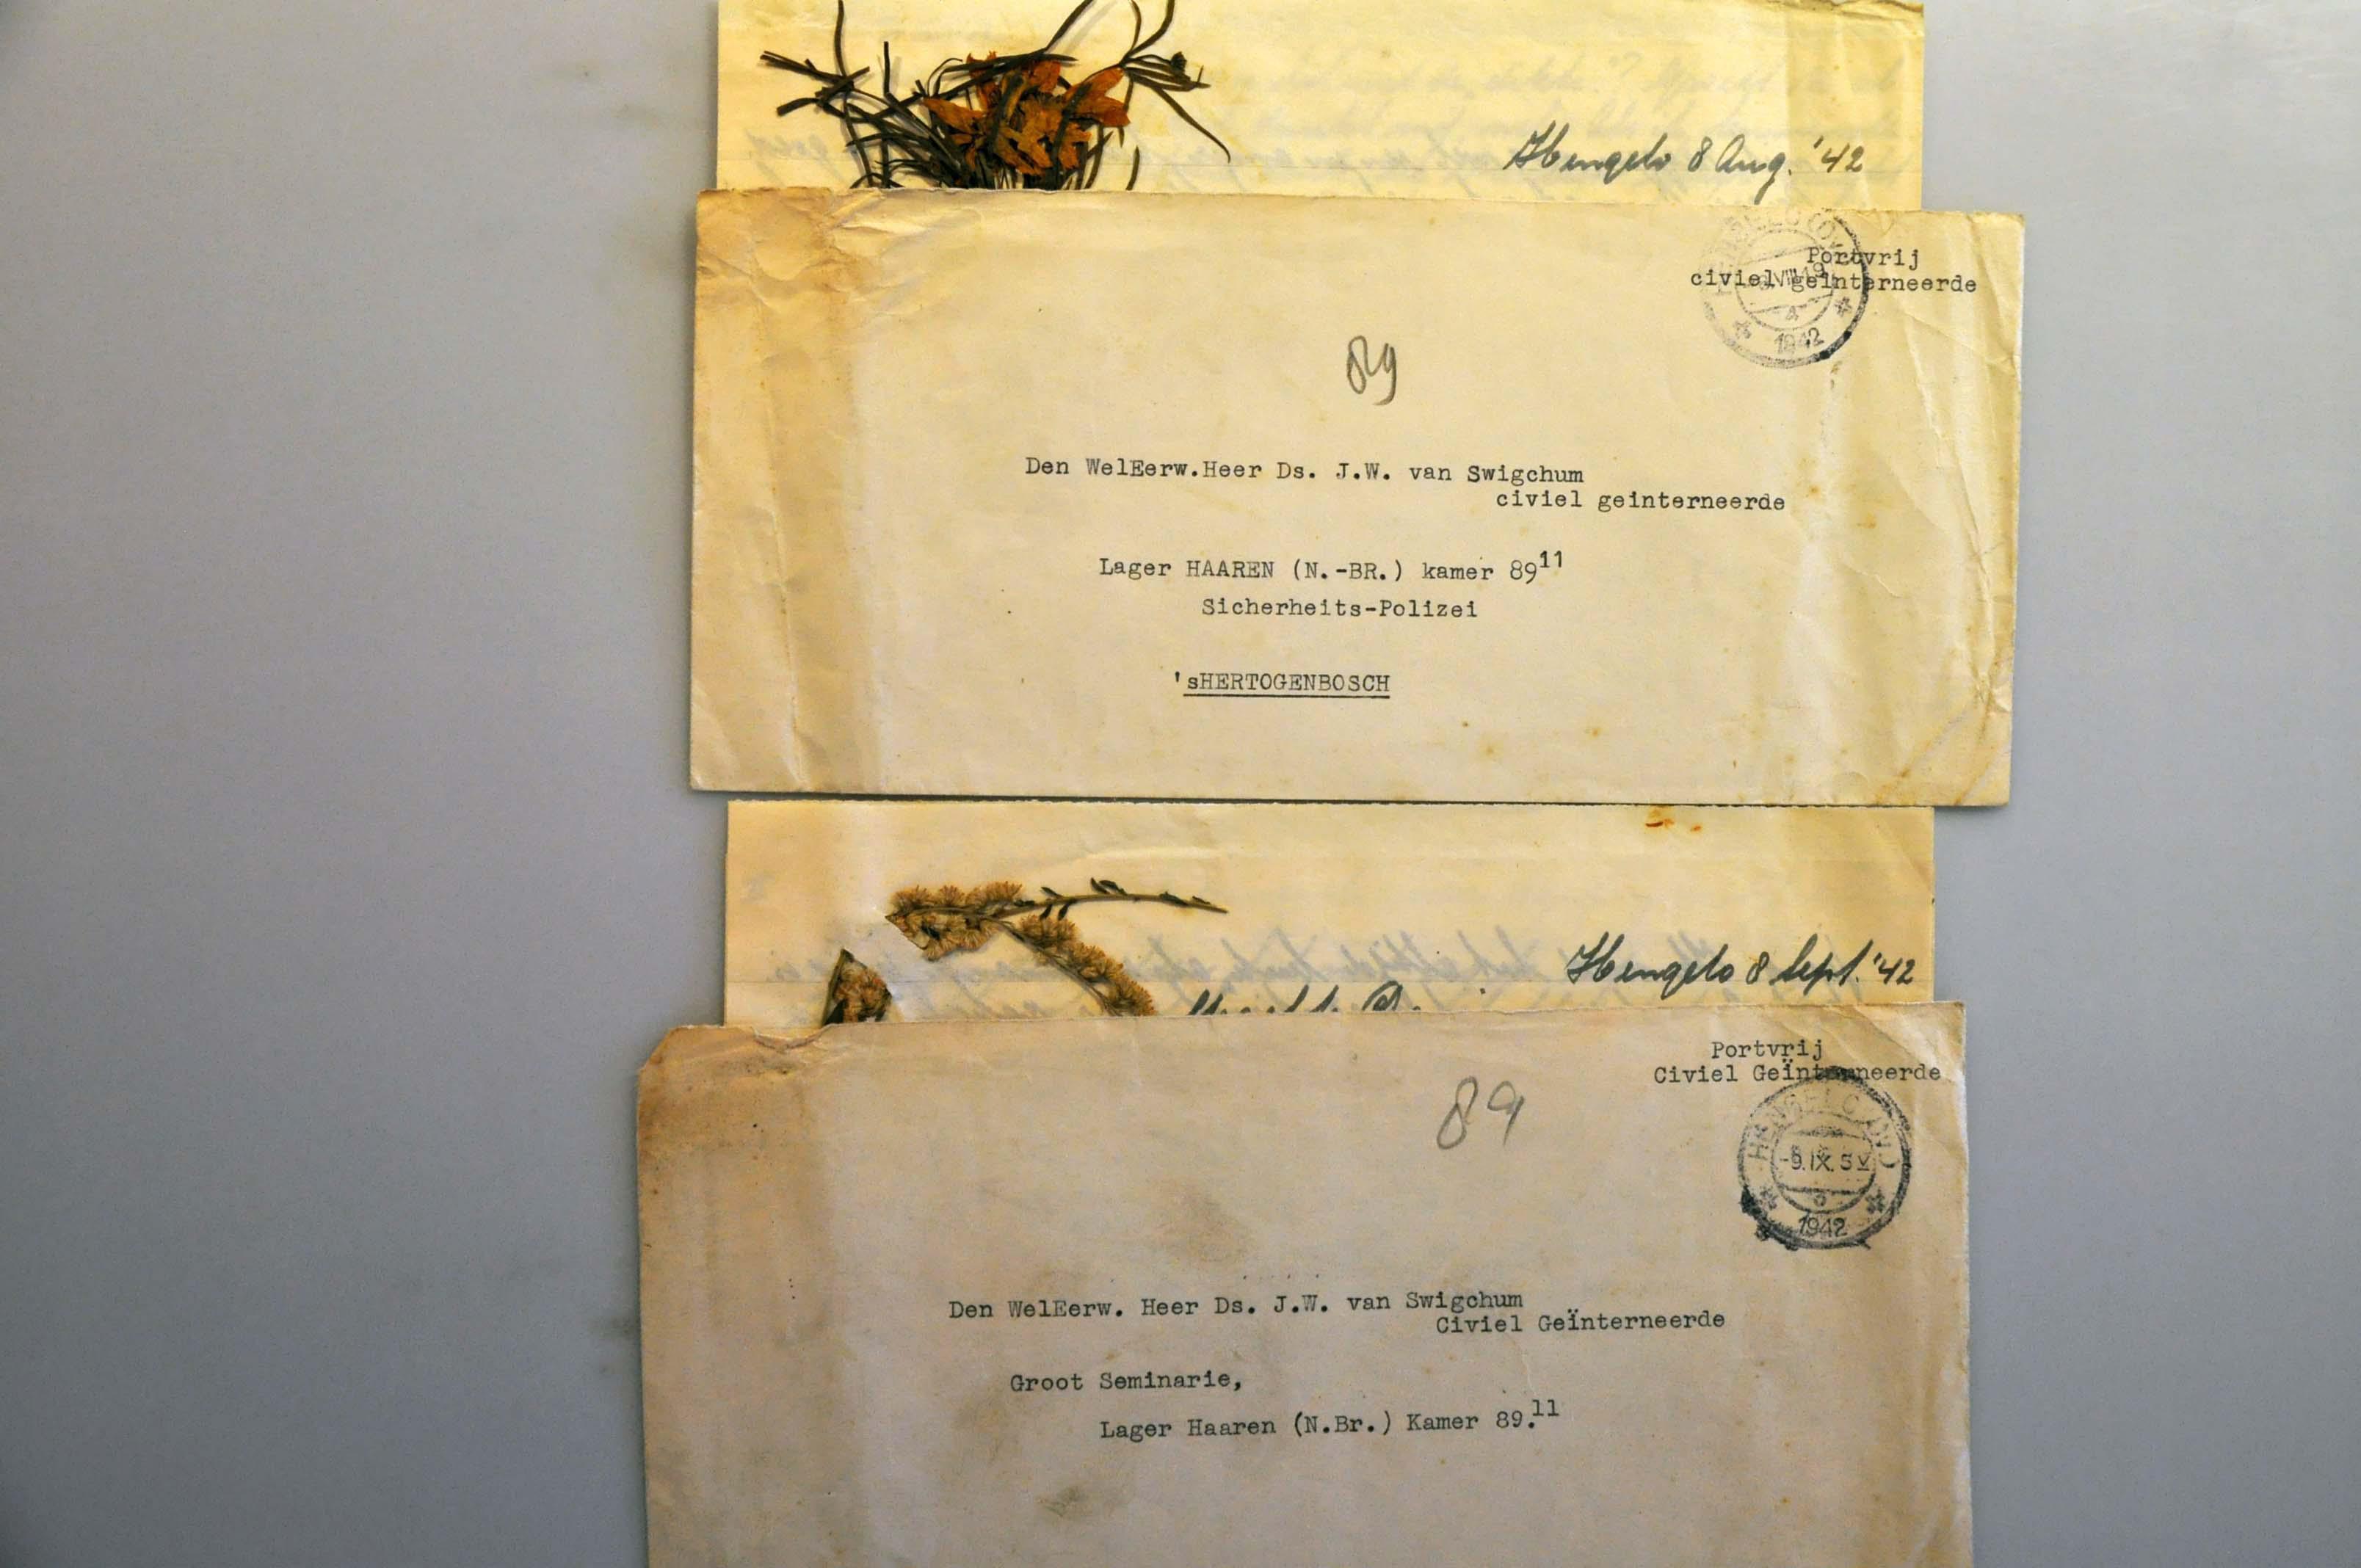 Lot 1011 - Topics and Miscellaneous world war ii -  Corinphila veilingen Auction 235: Postal History WW2 - The Stefan Drukker Collection